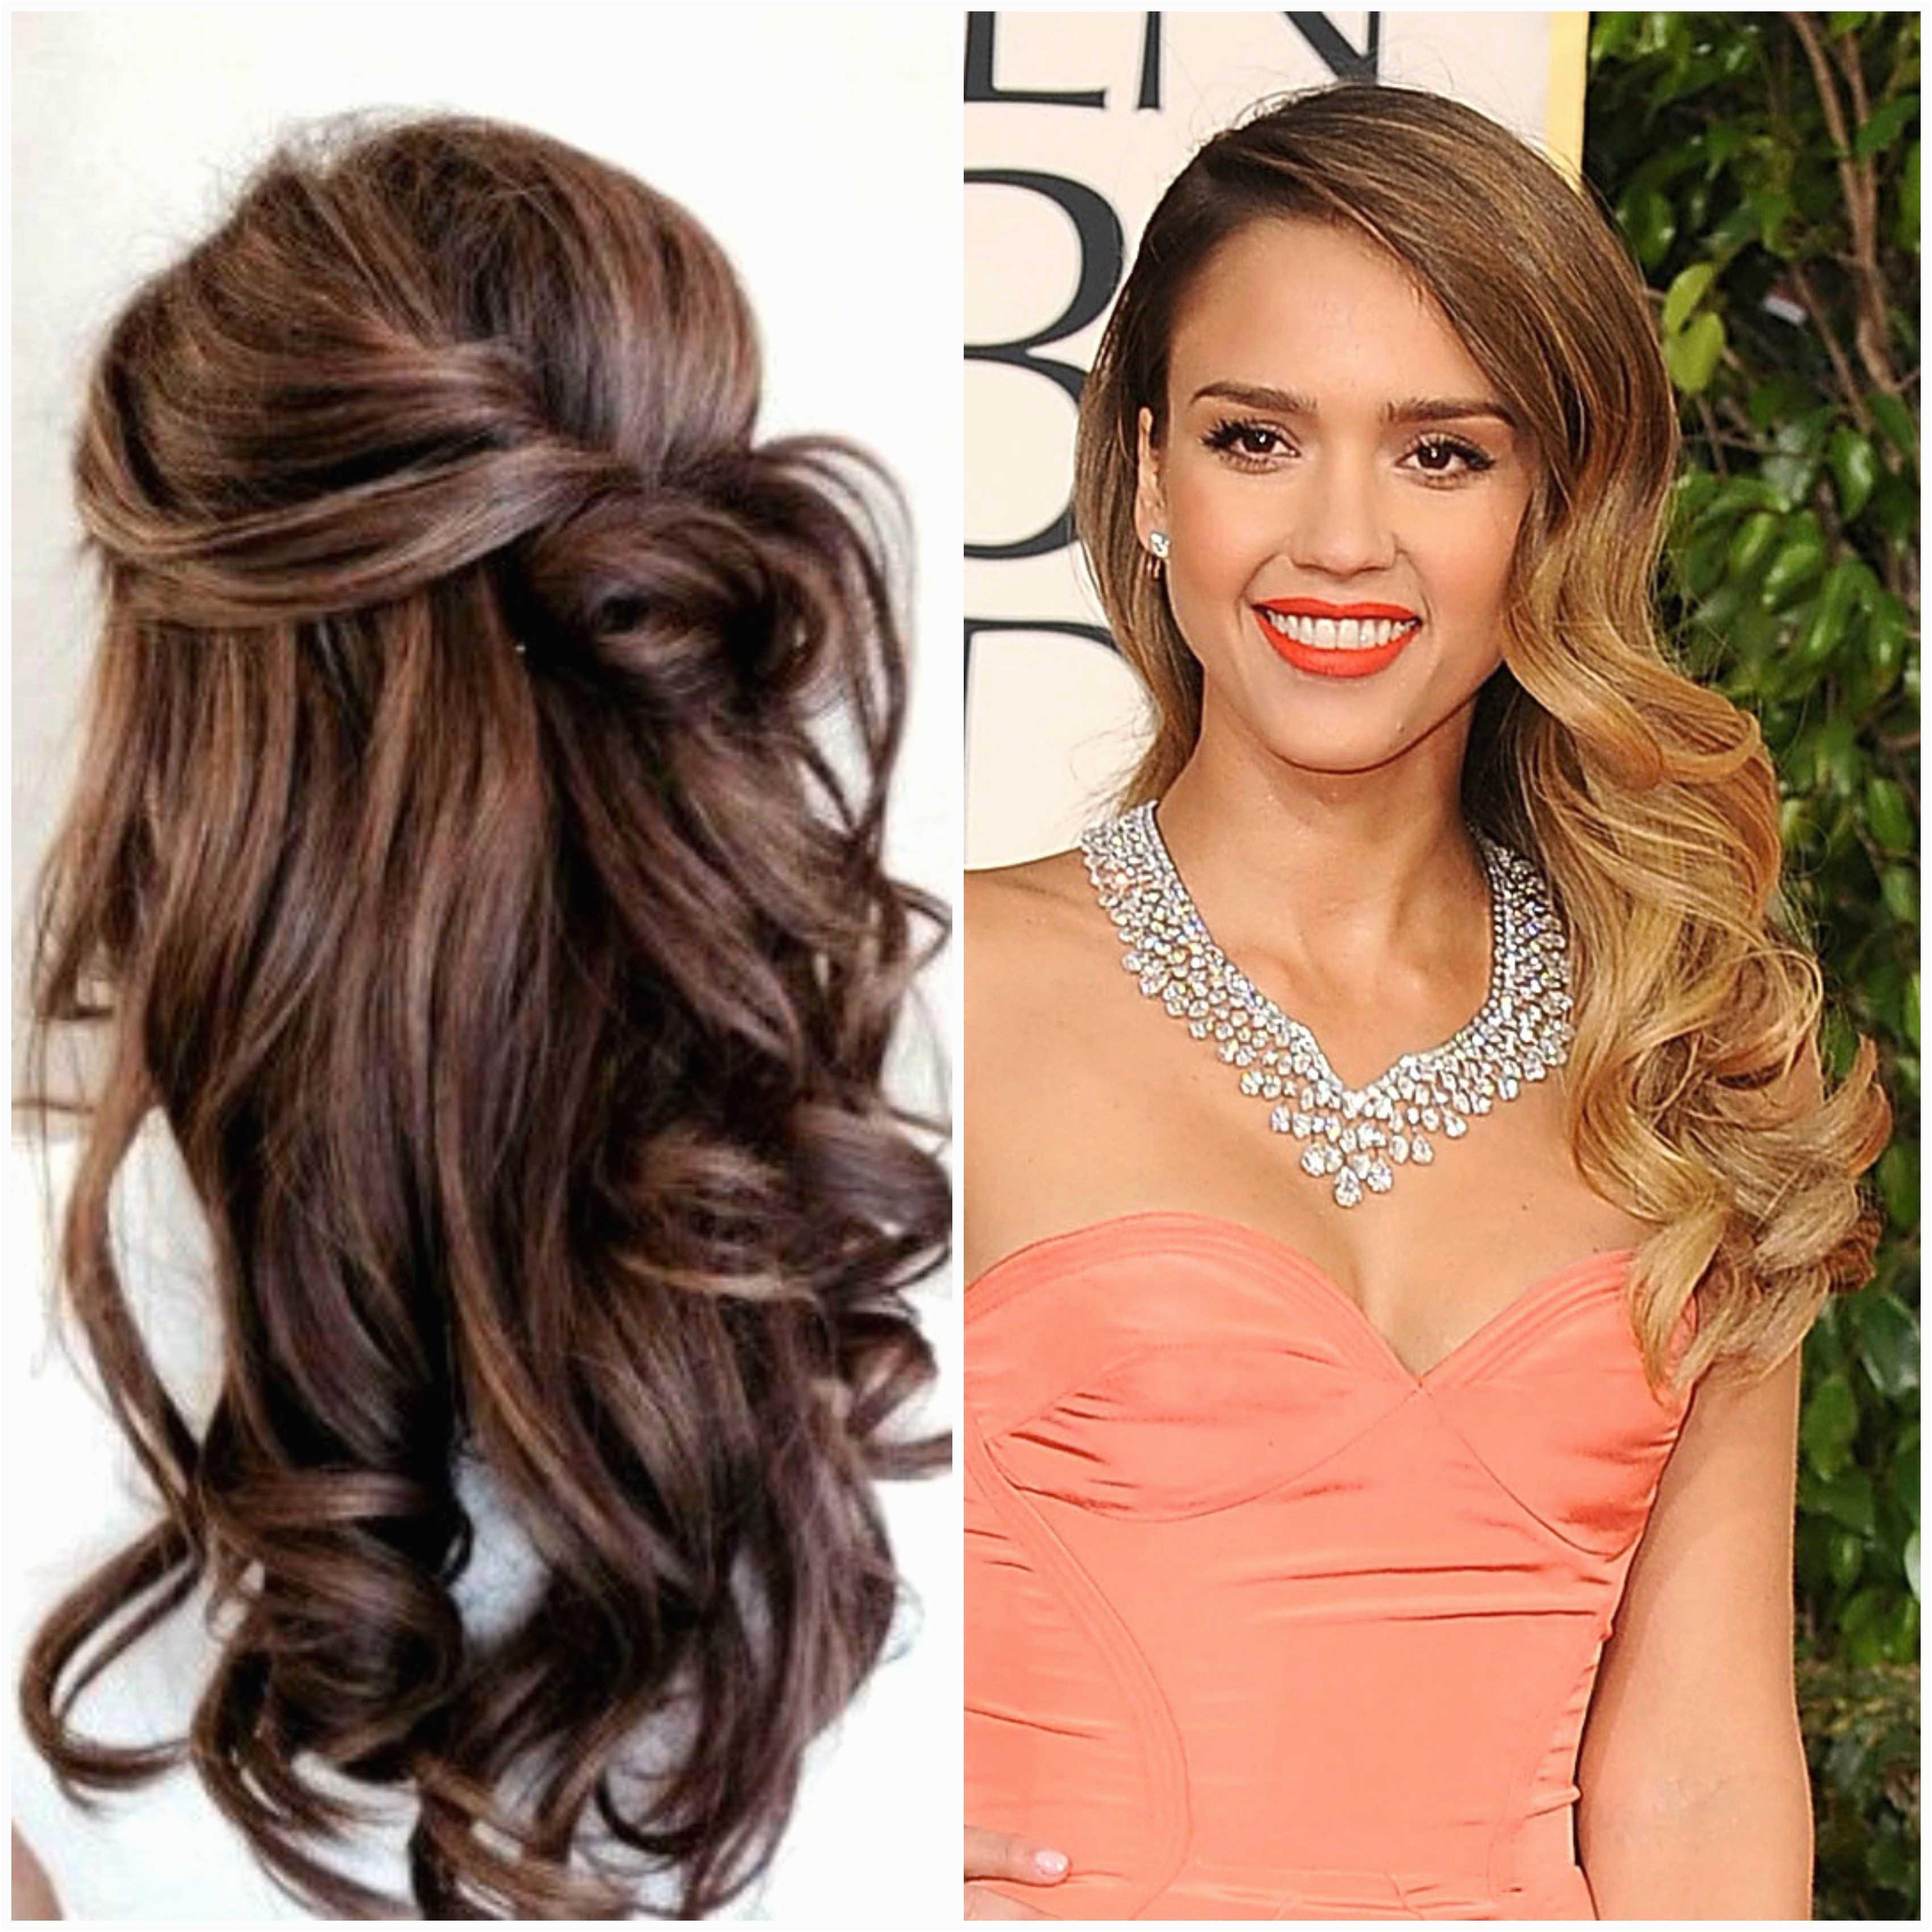 Modern Medium Hairstyles for Girls Elegant Hairstyles for Long Hair 2015 Luxury I Pinimg 1200x 0d